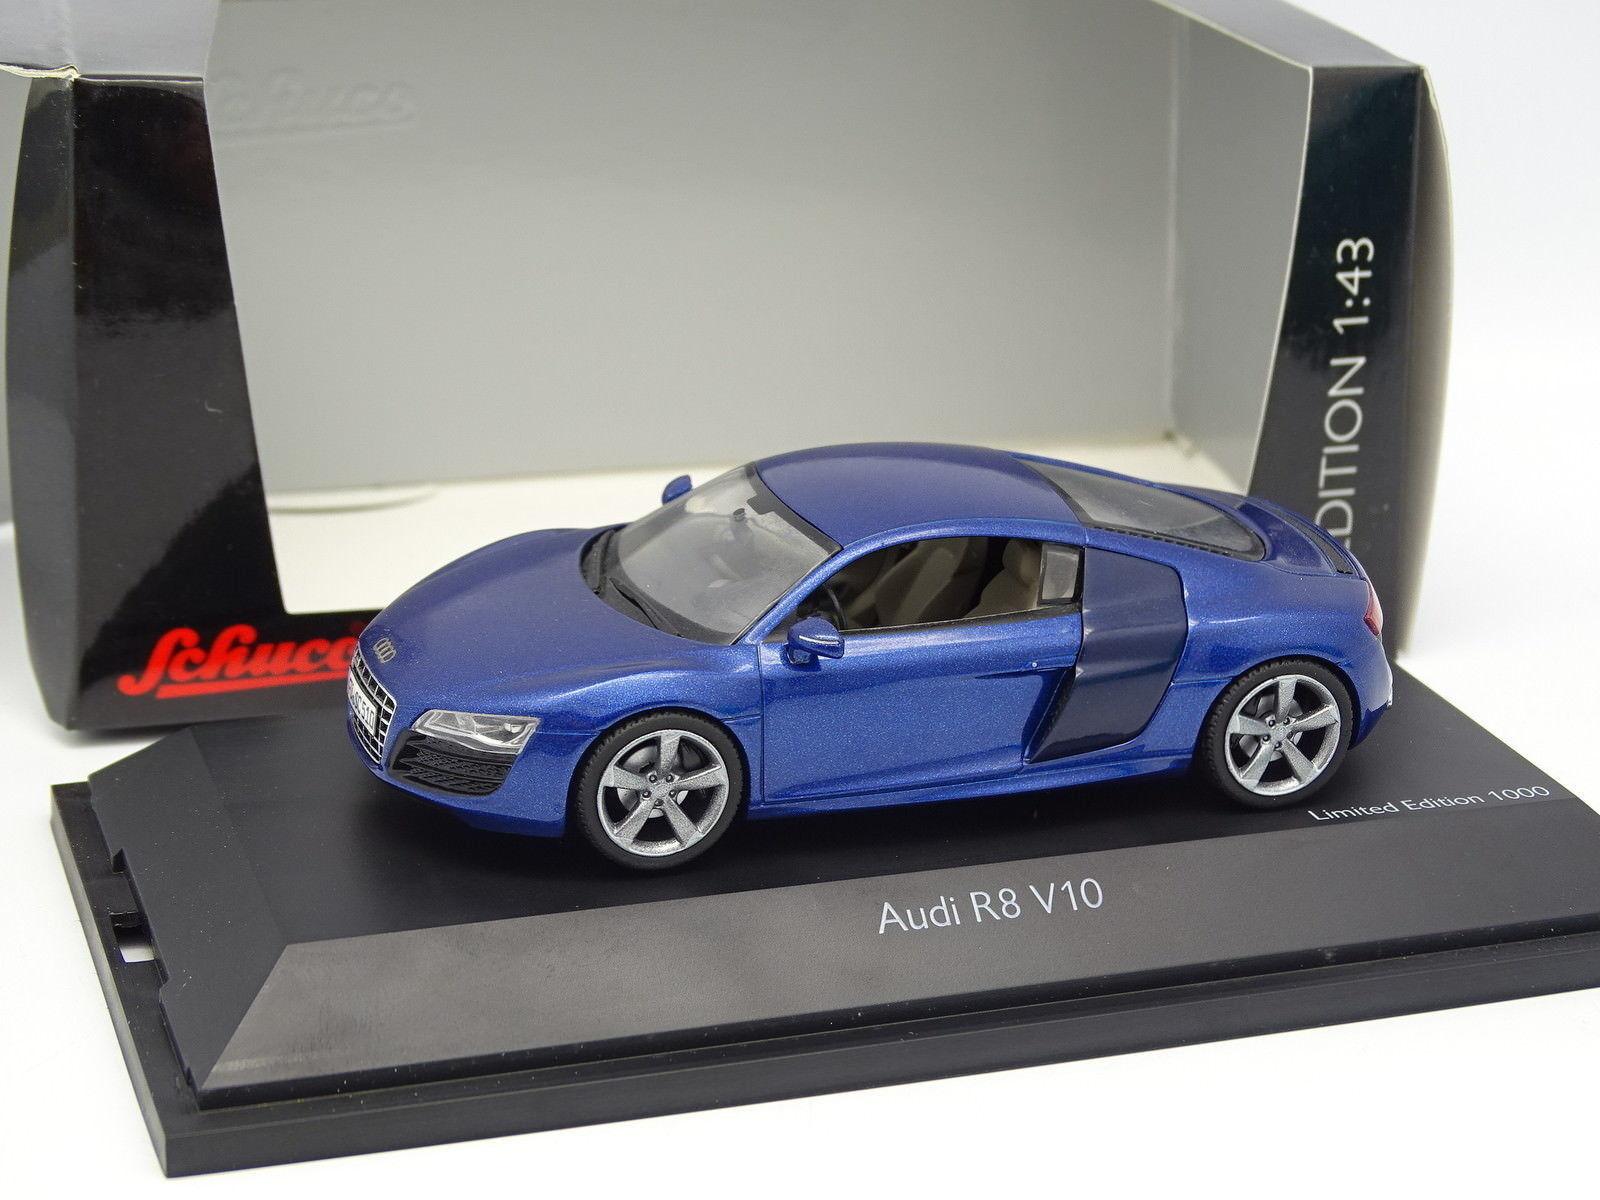 Schuco 1 43 - Audi R8 V10 blu